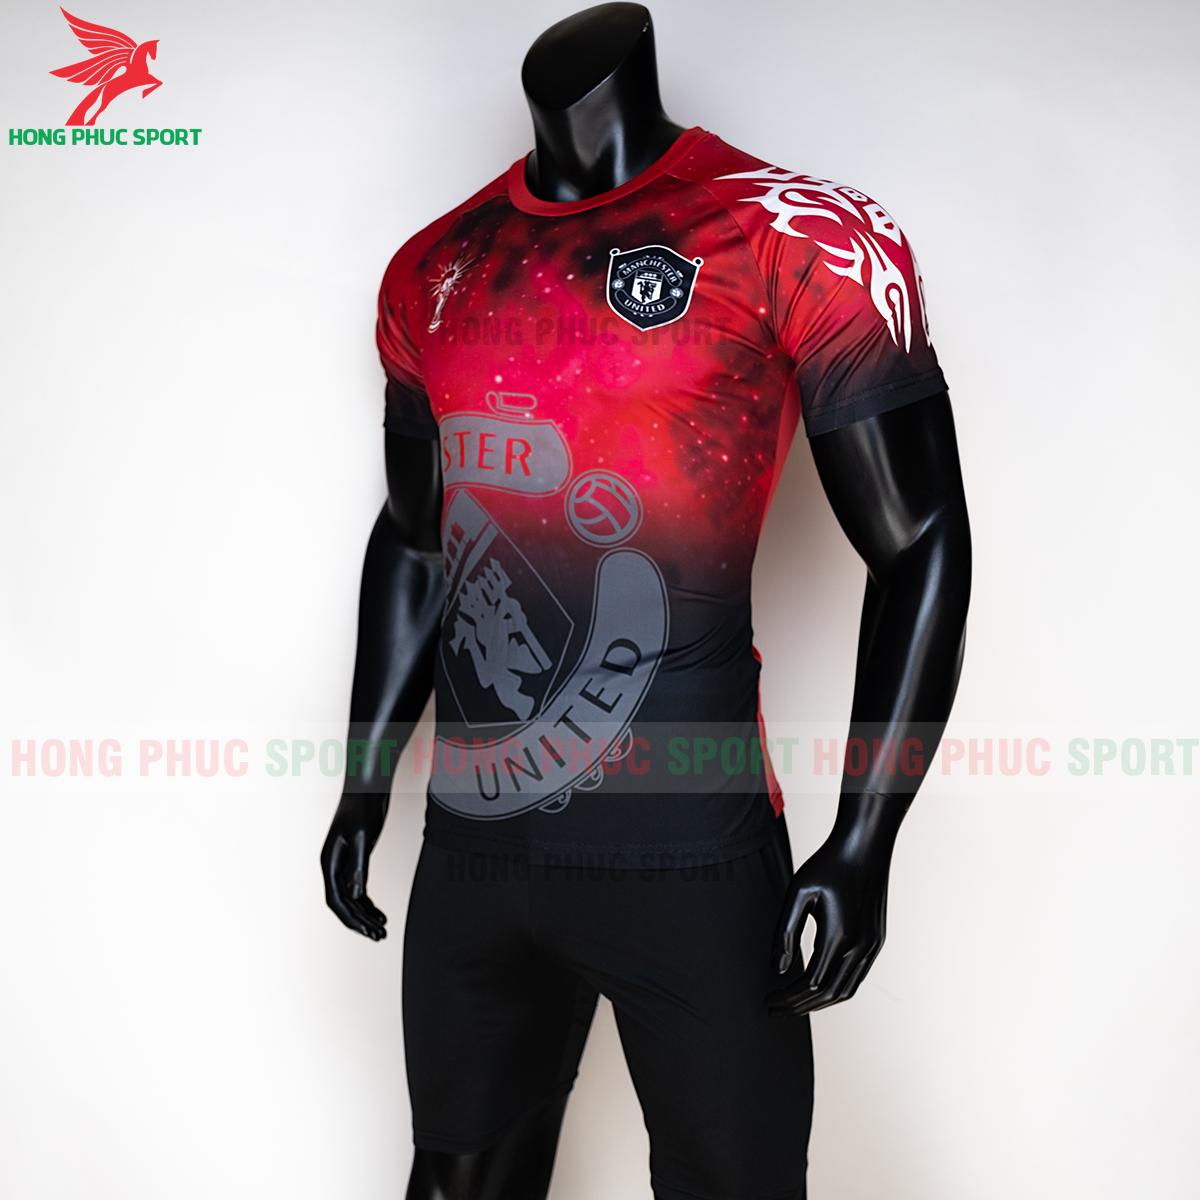 https://cdn.hongphucsport.com/unsafe/s4.shopbay.vn/files/285/ao-manchester-united-2020-phien-ban-fan-mau2-3-5f72be511f707.png